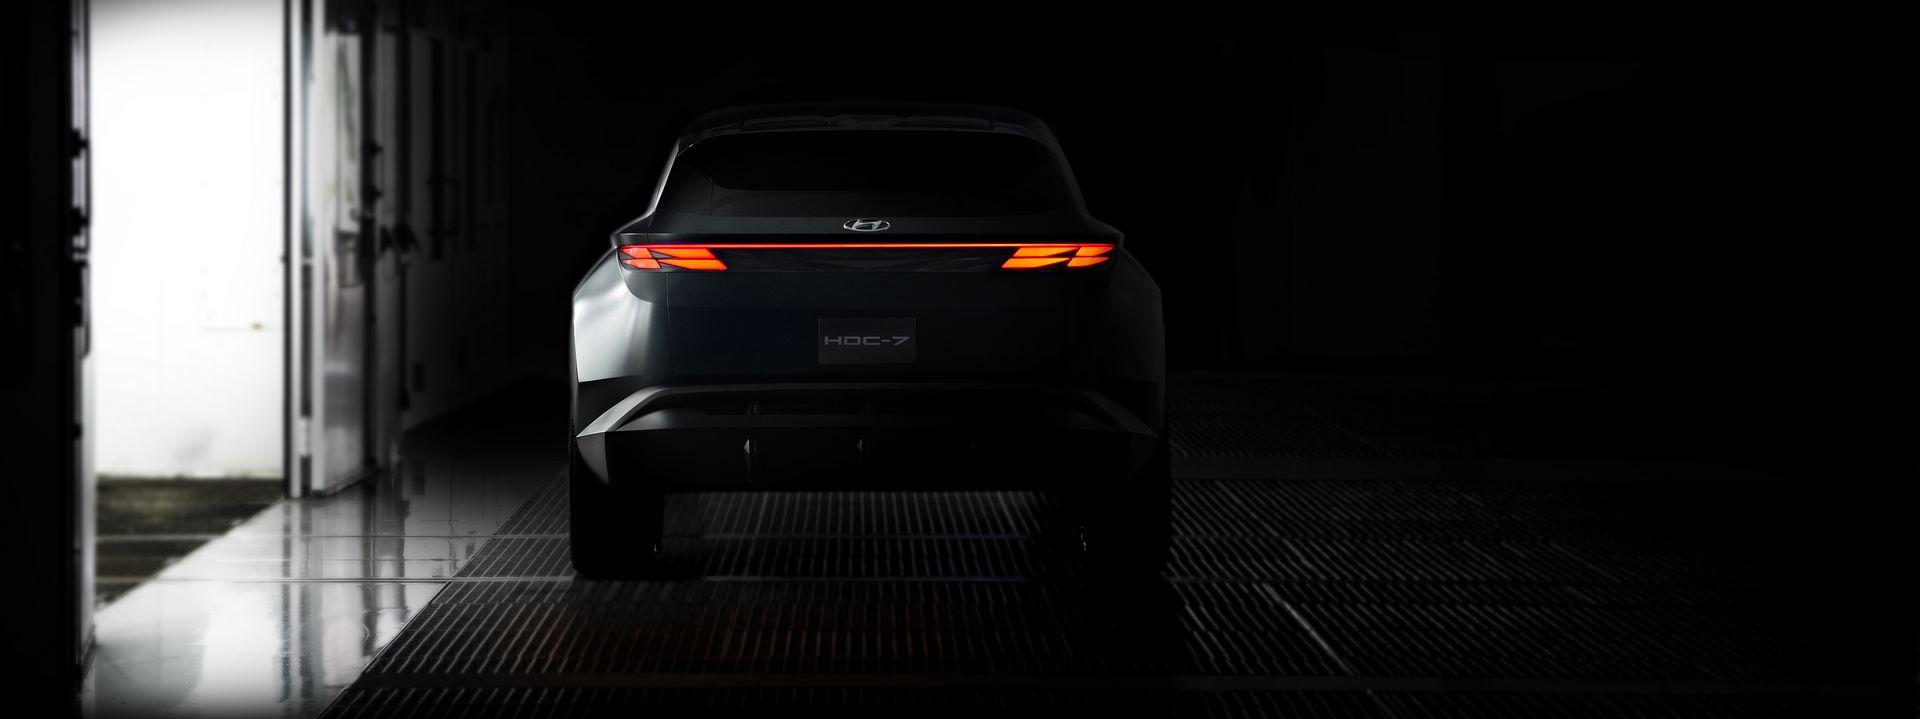 Hyundai-Vision-T-Concept-7